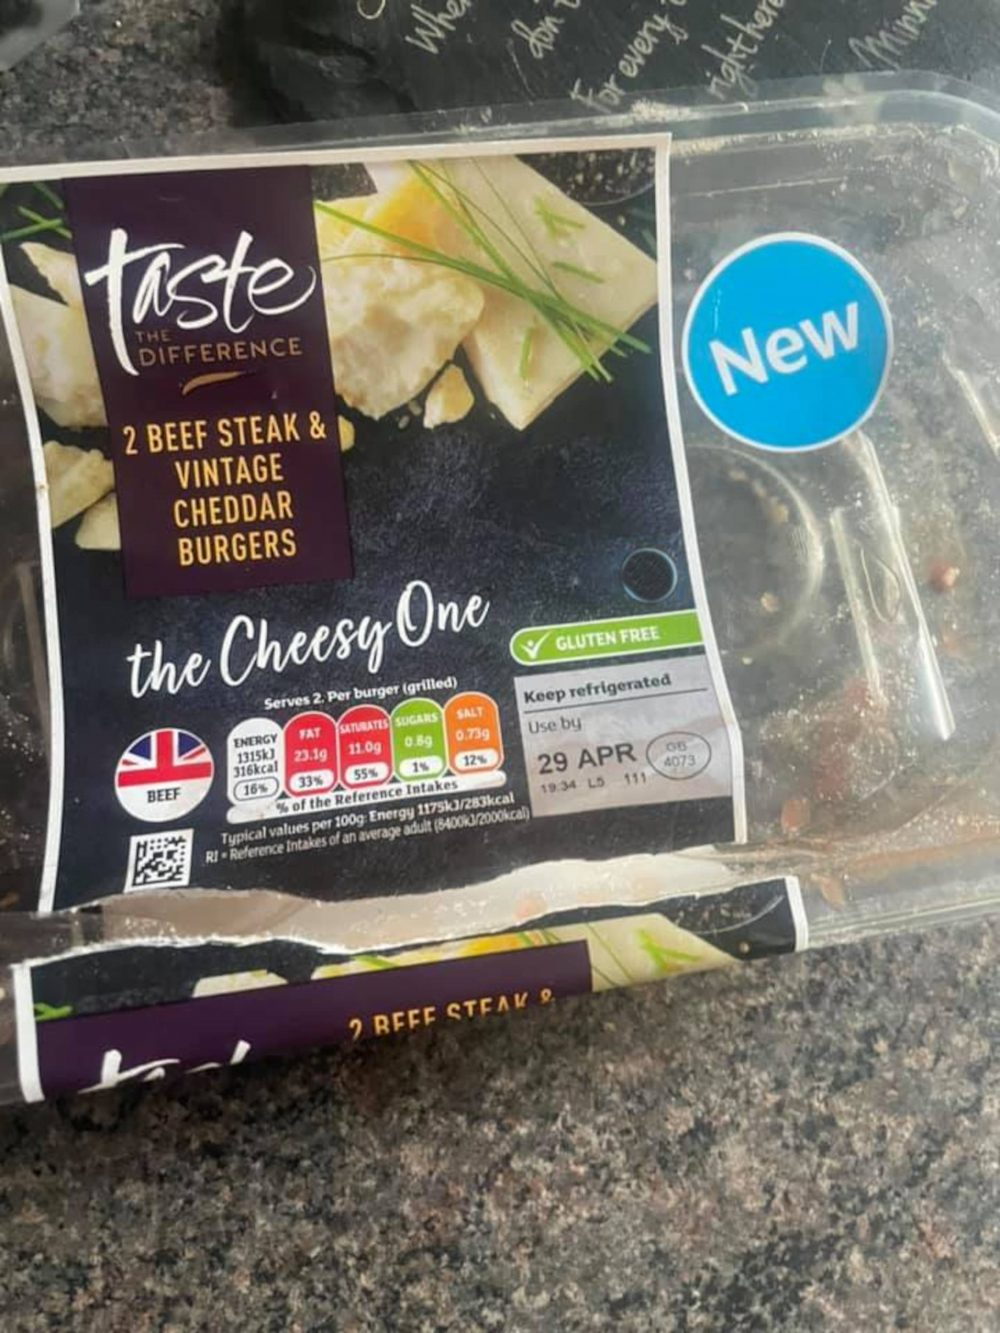 Sainsburys mush burger | Food and Drink News UK